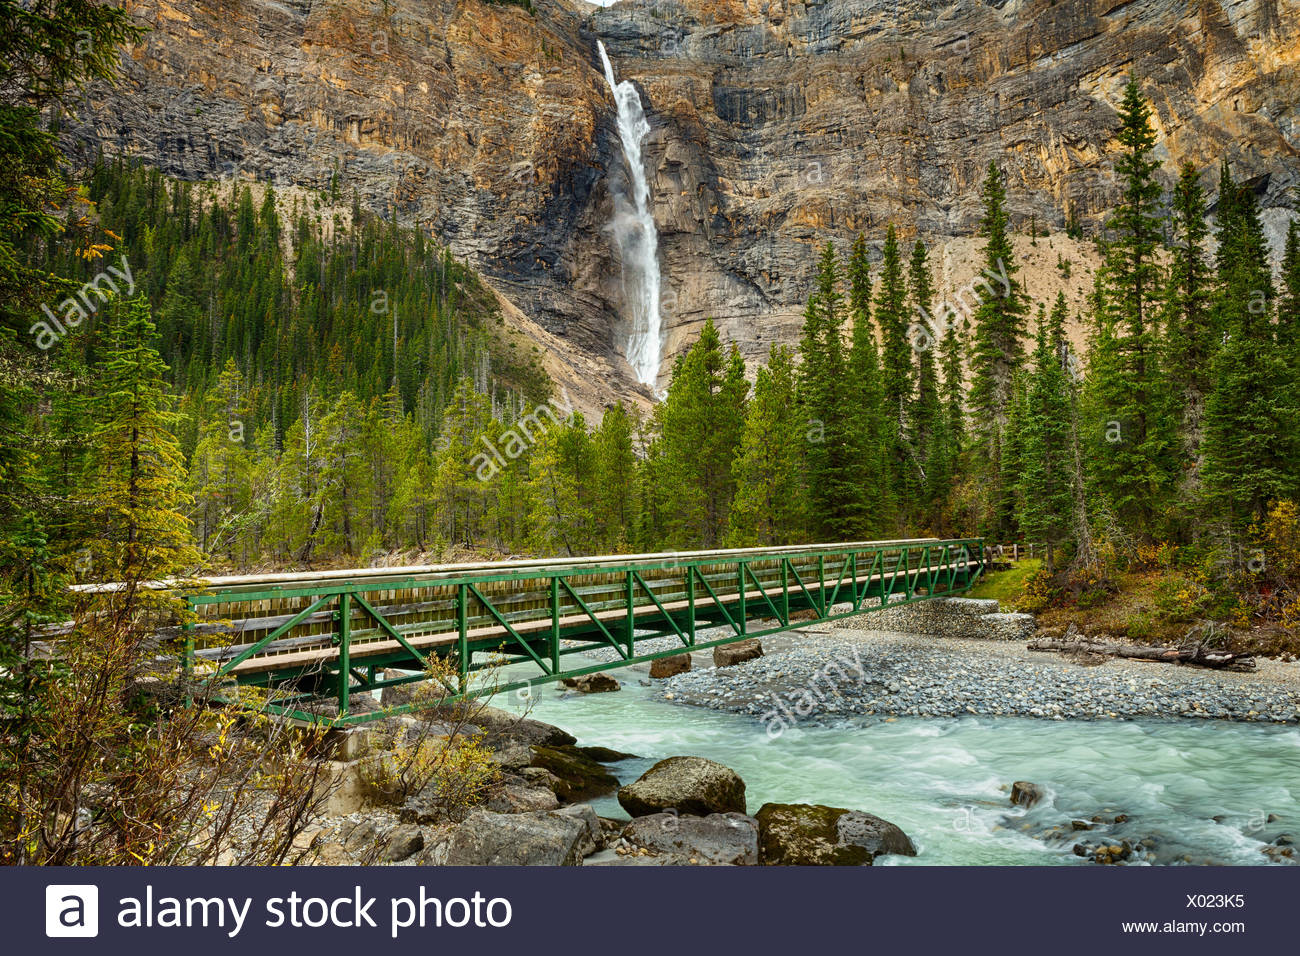 Takakkaw Falls,  Yoho National Park, British Columbia, Canada Stock Photo